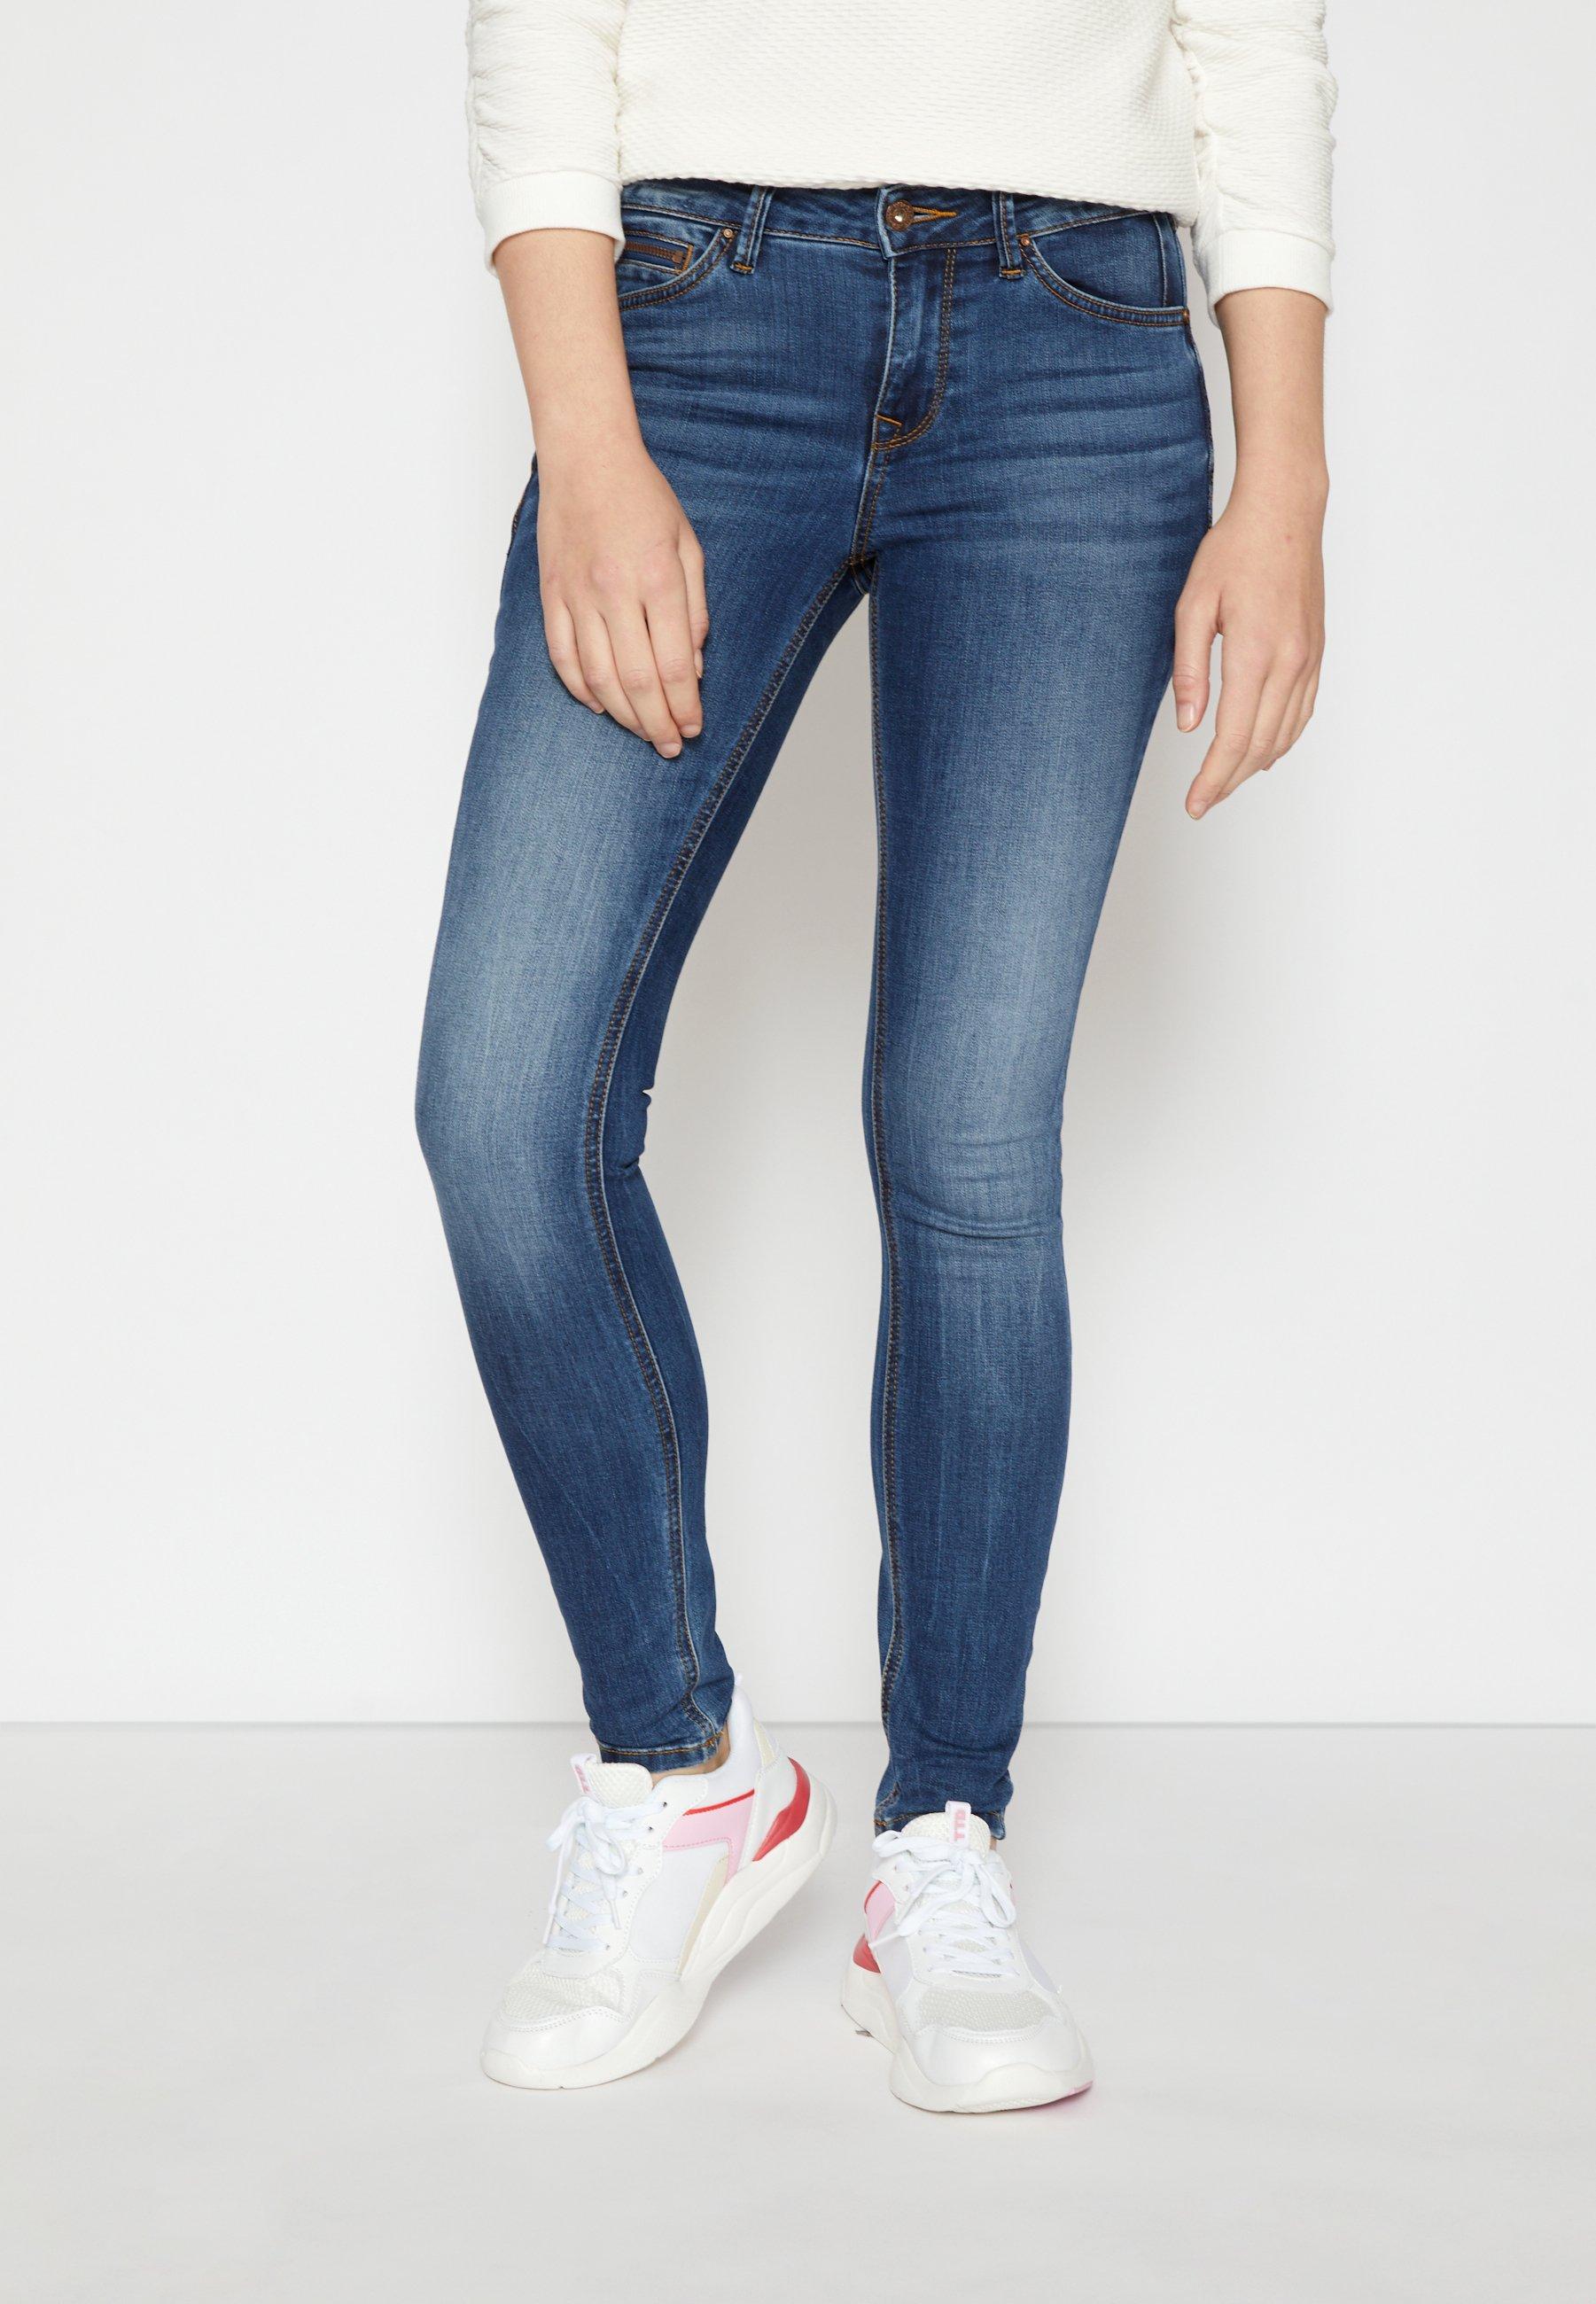 Women JONA - Jeans Skinny Fit - clean mid stone blue denim